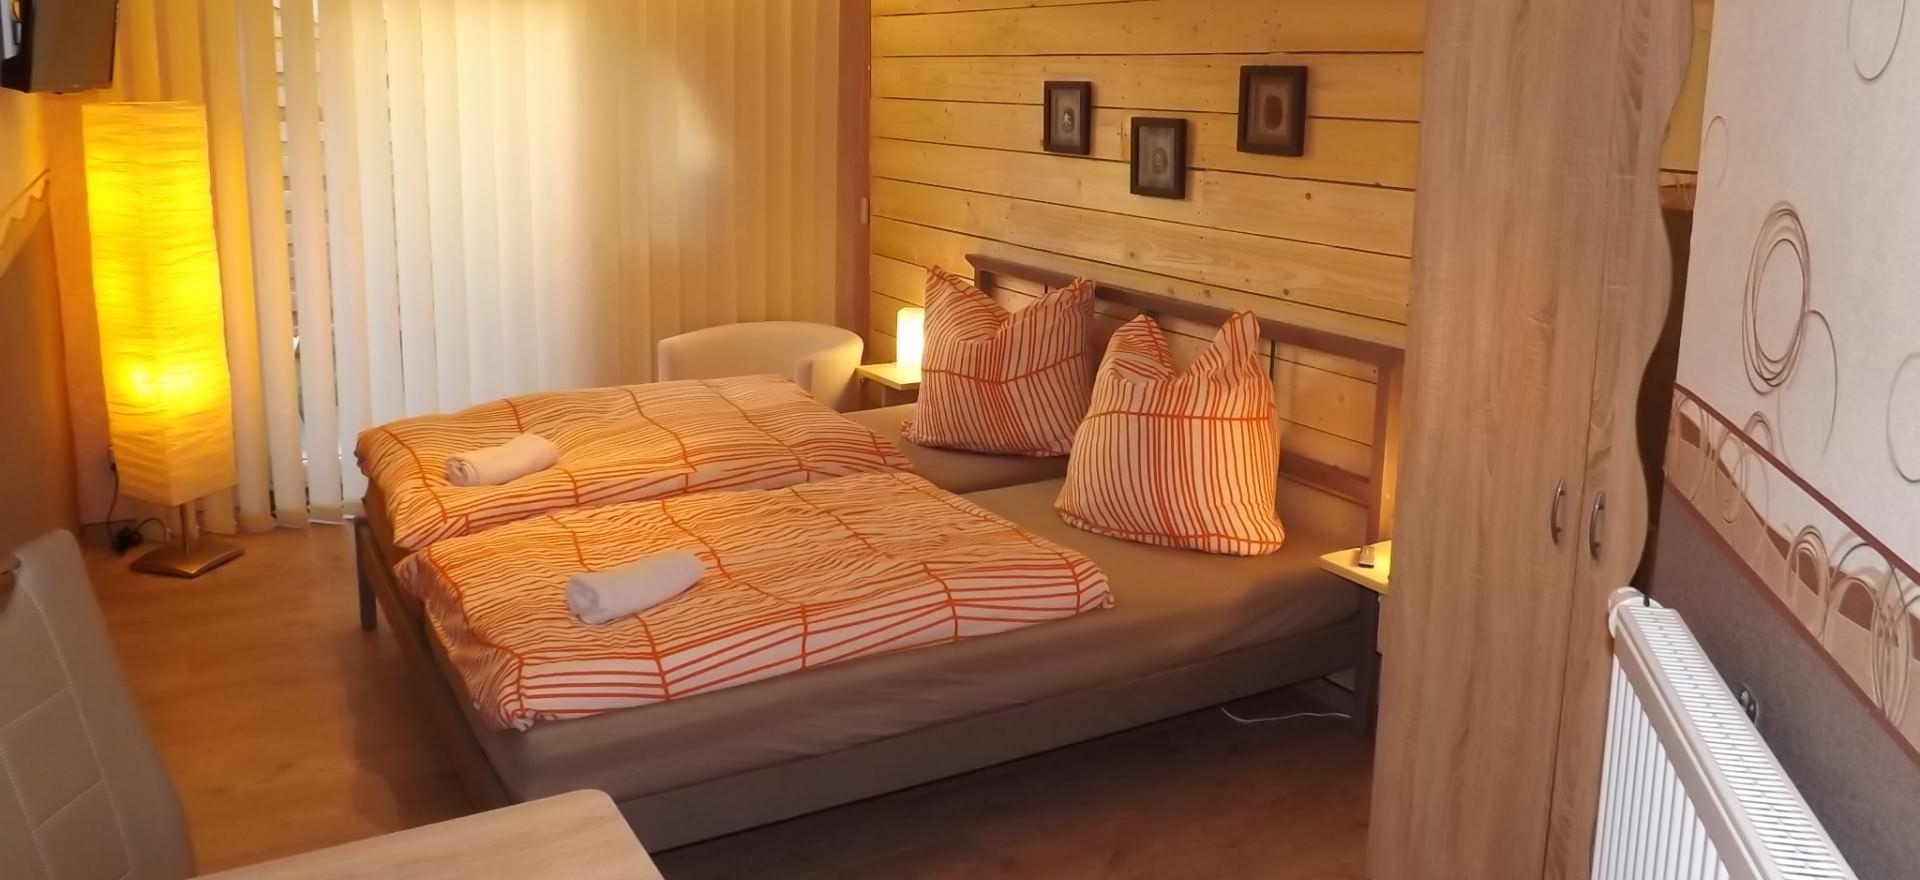 Hotel Pension Haus Oberkassel in Bonn preiswerte Zimmer